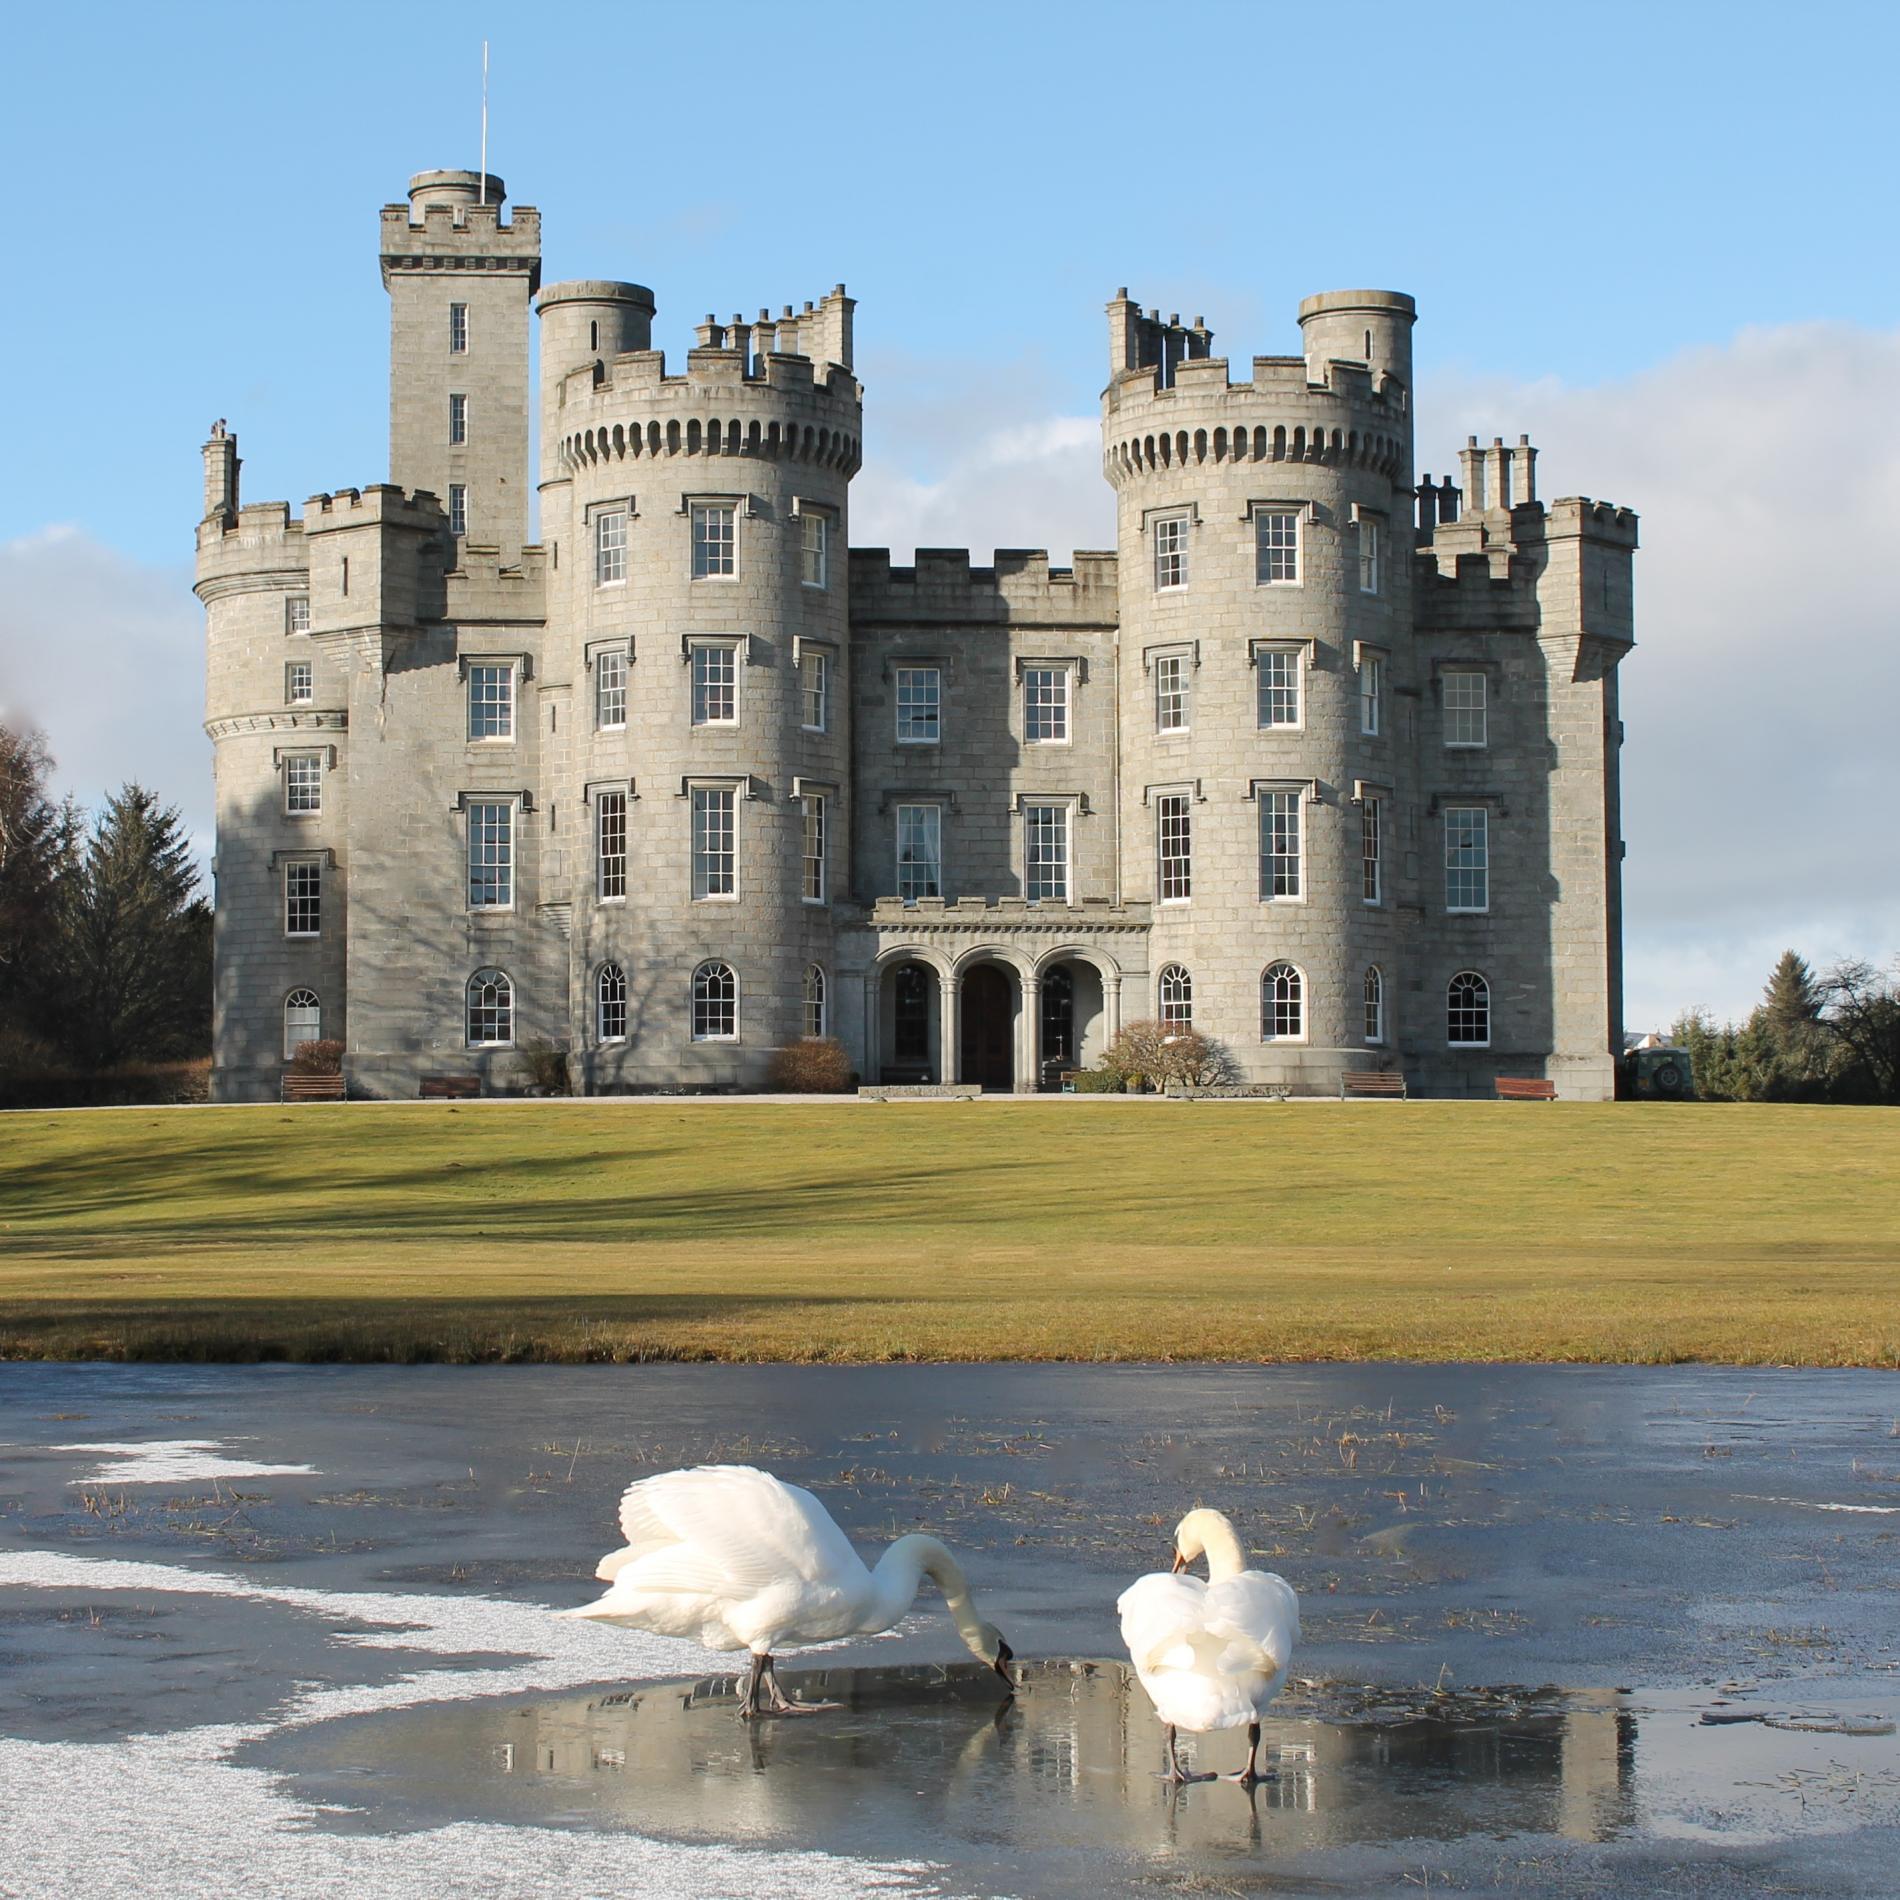 Best Romantic Hotels Scotland: Cluny Castle, Aberdeenshire